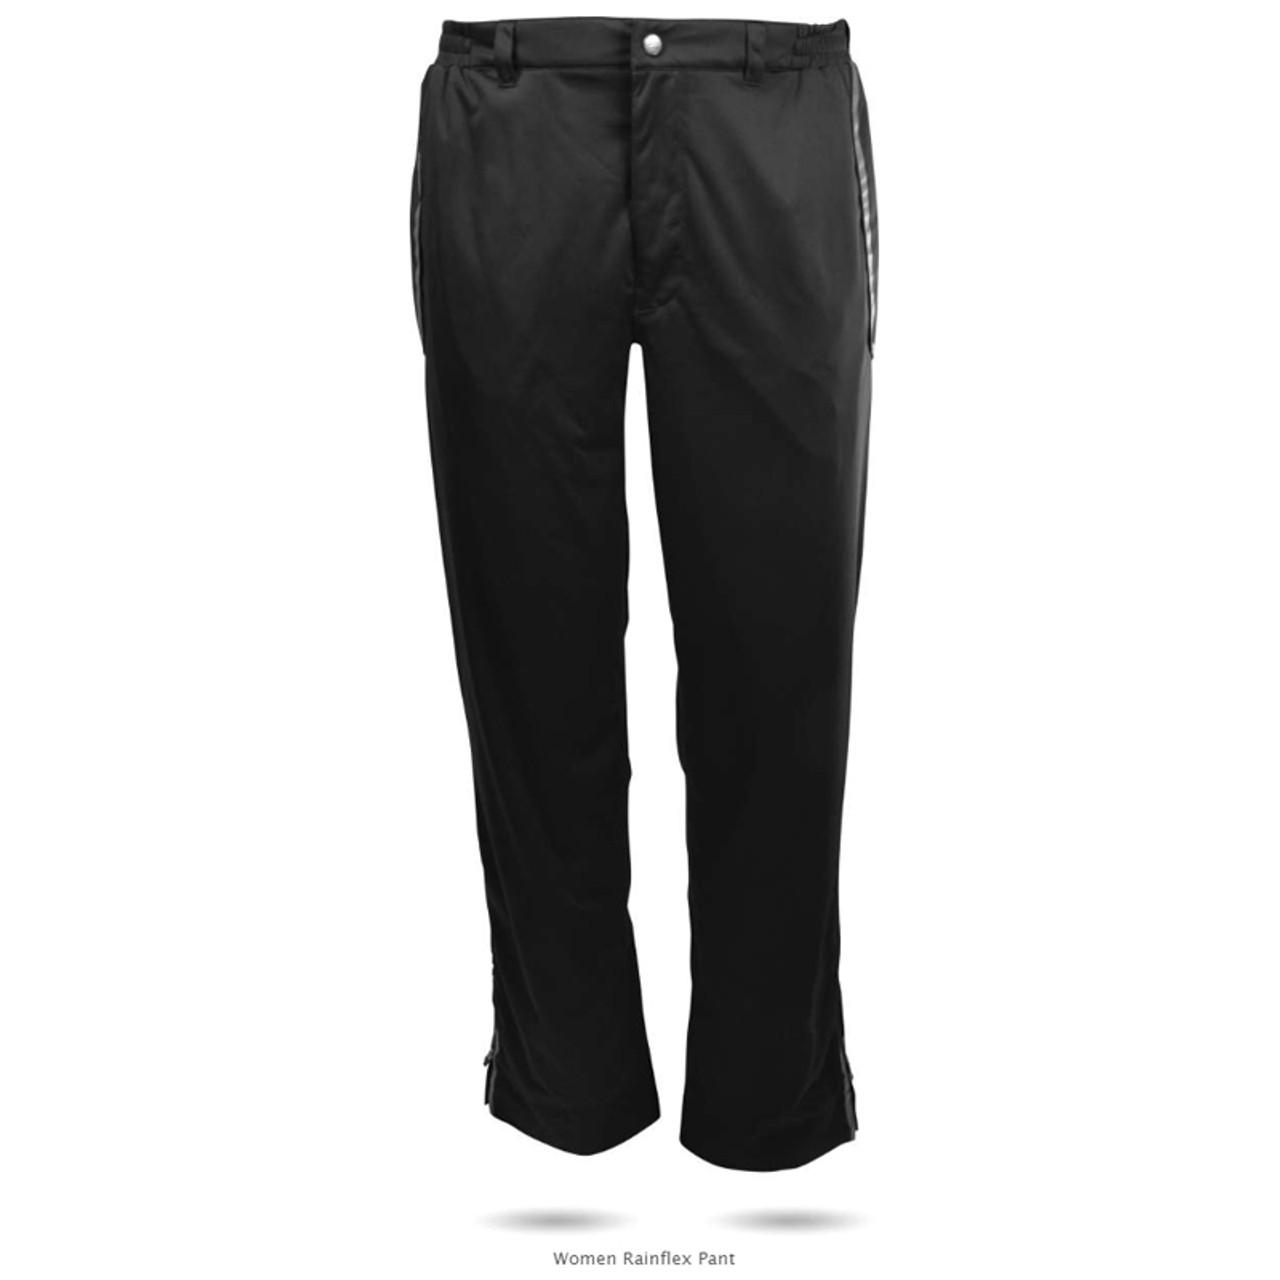 Sun Mountain Womens RainFlex Pants - Black